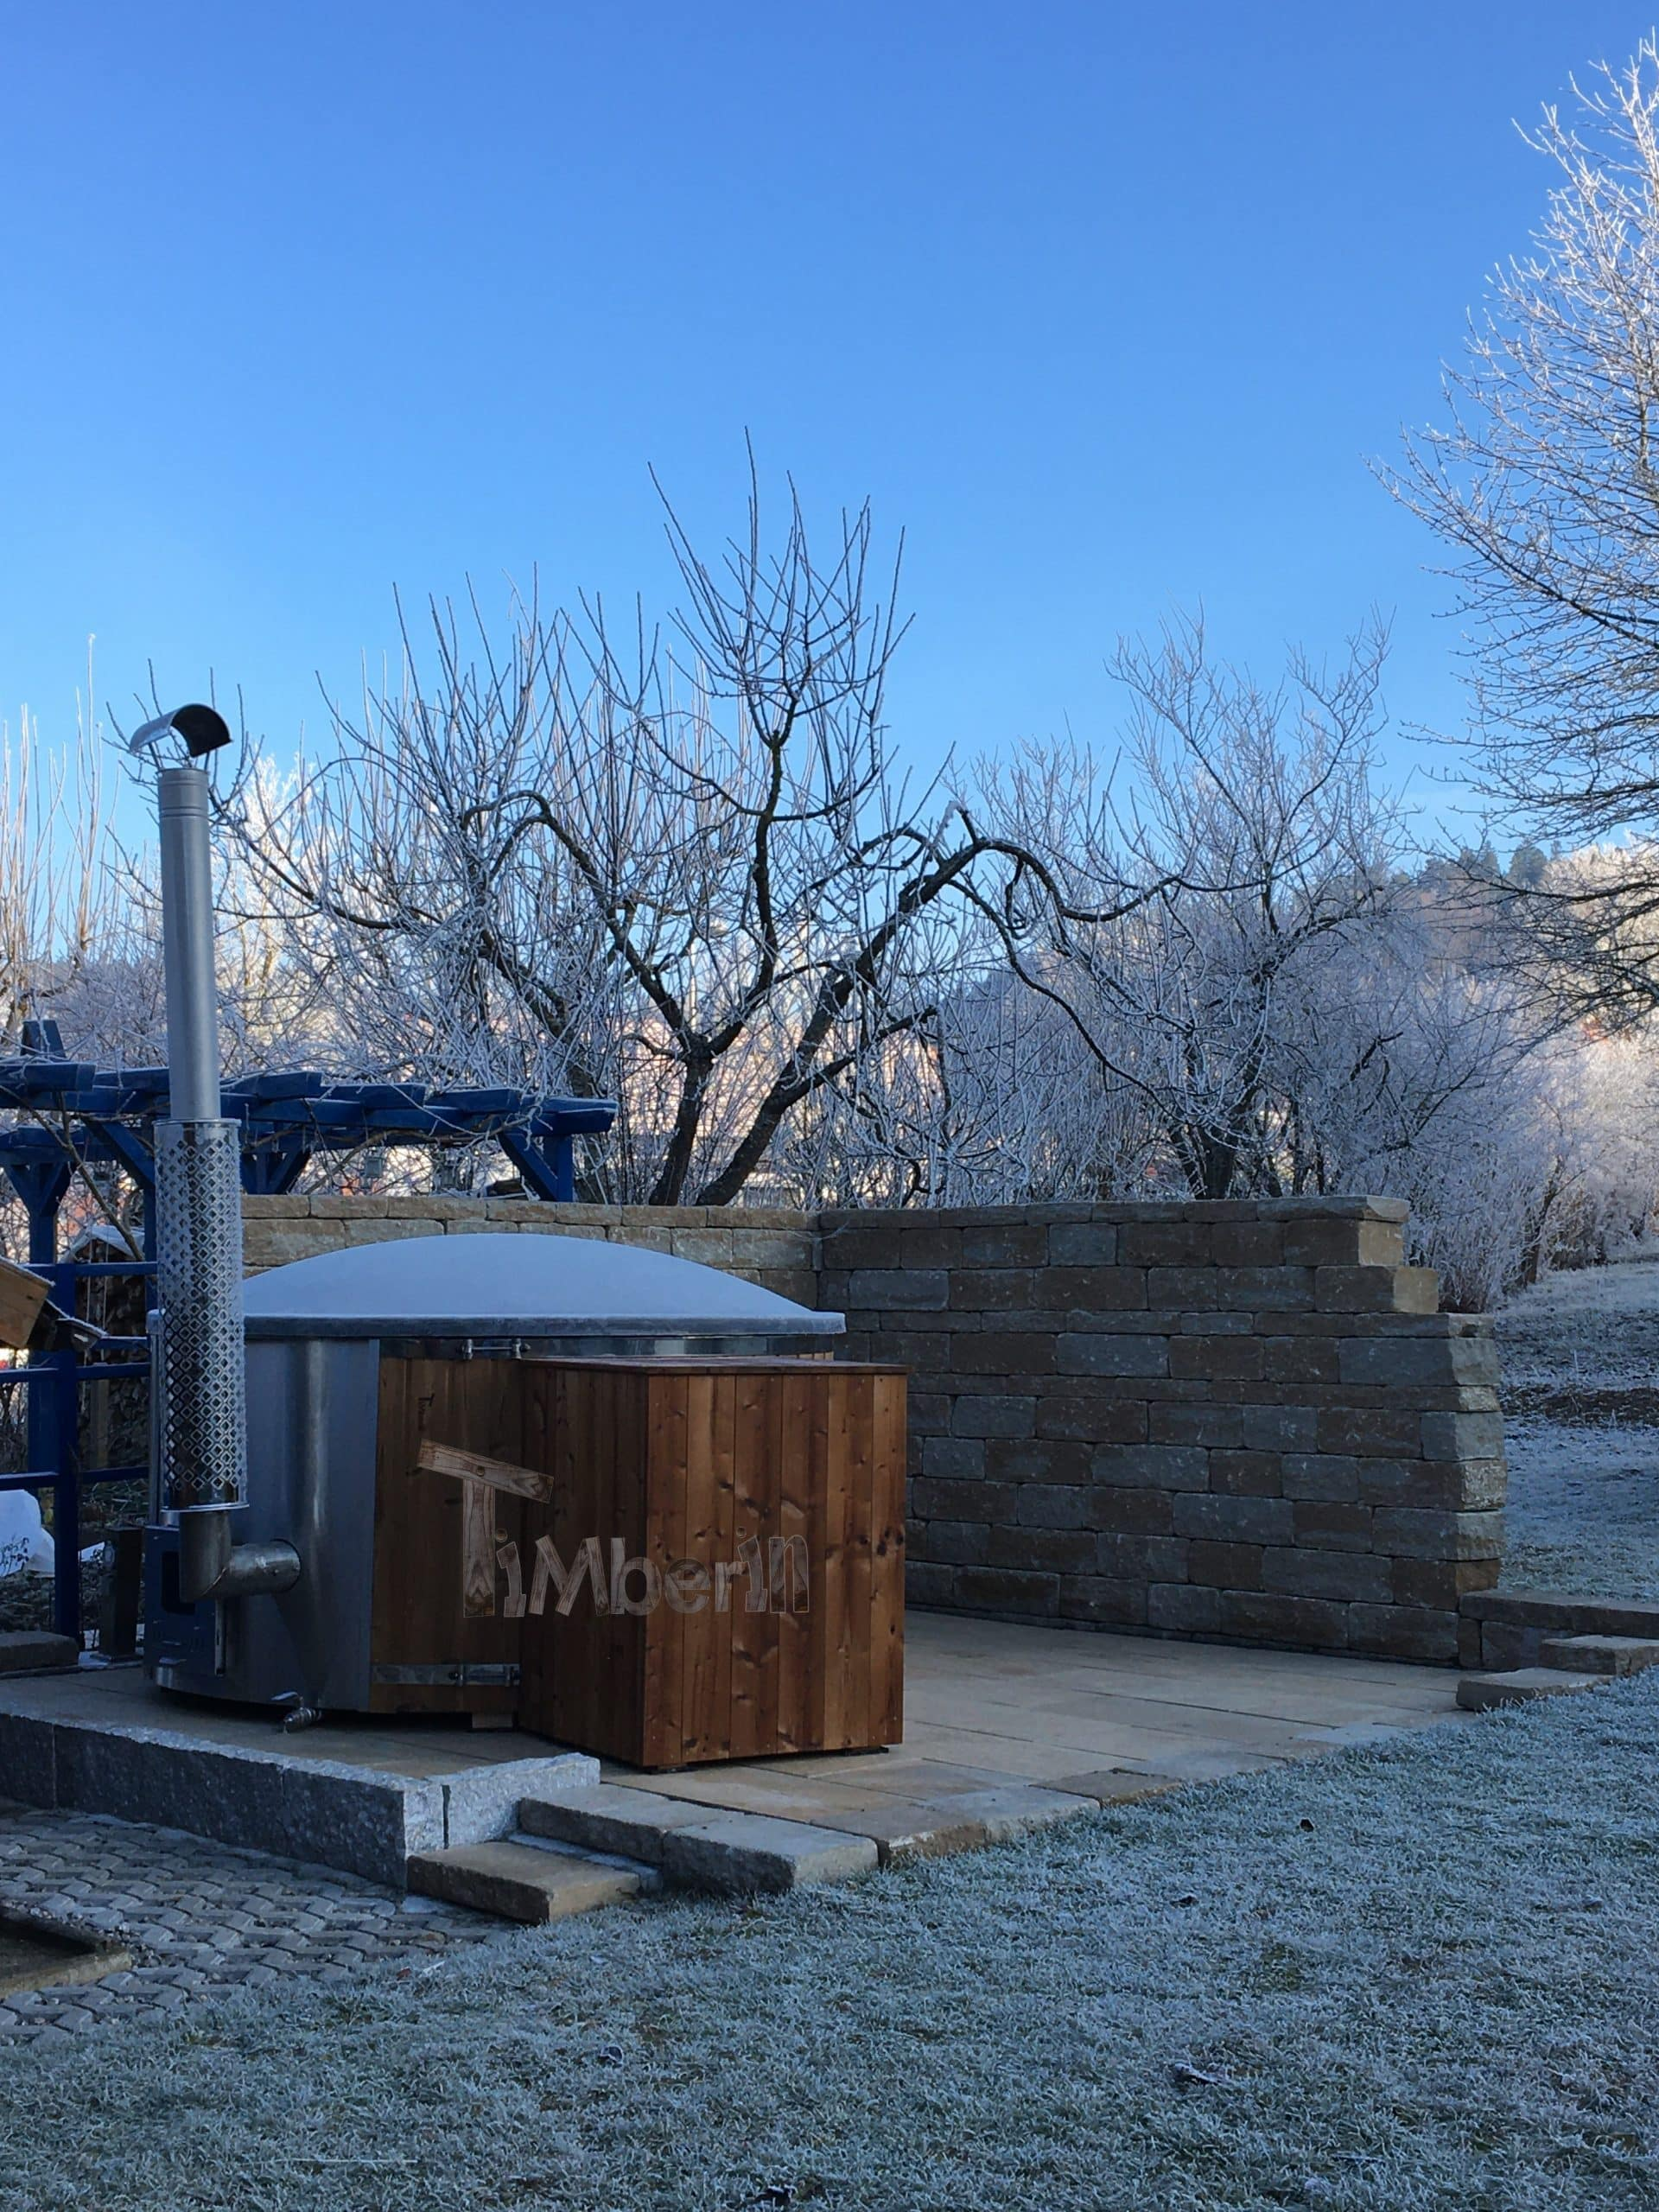 IMG_4871-scaled Bewertungen - Erfahrung TimberIN